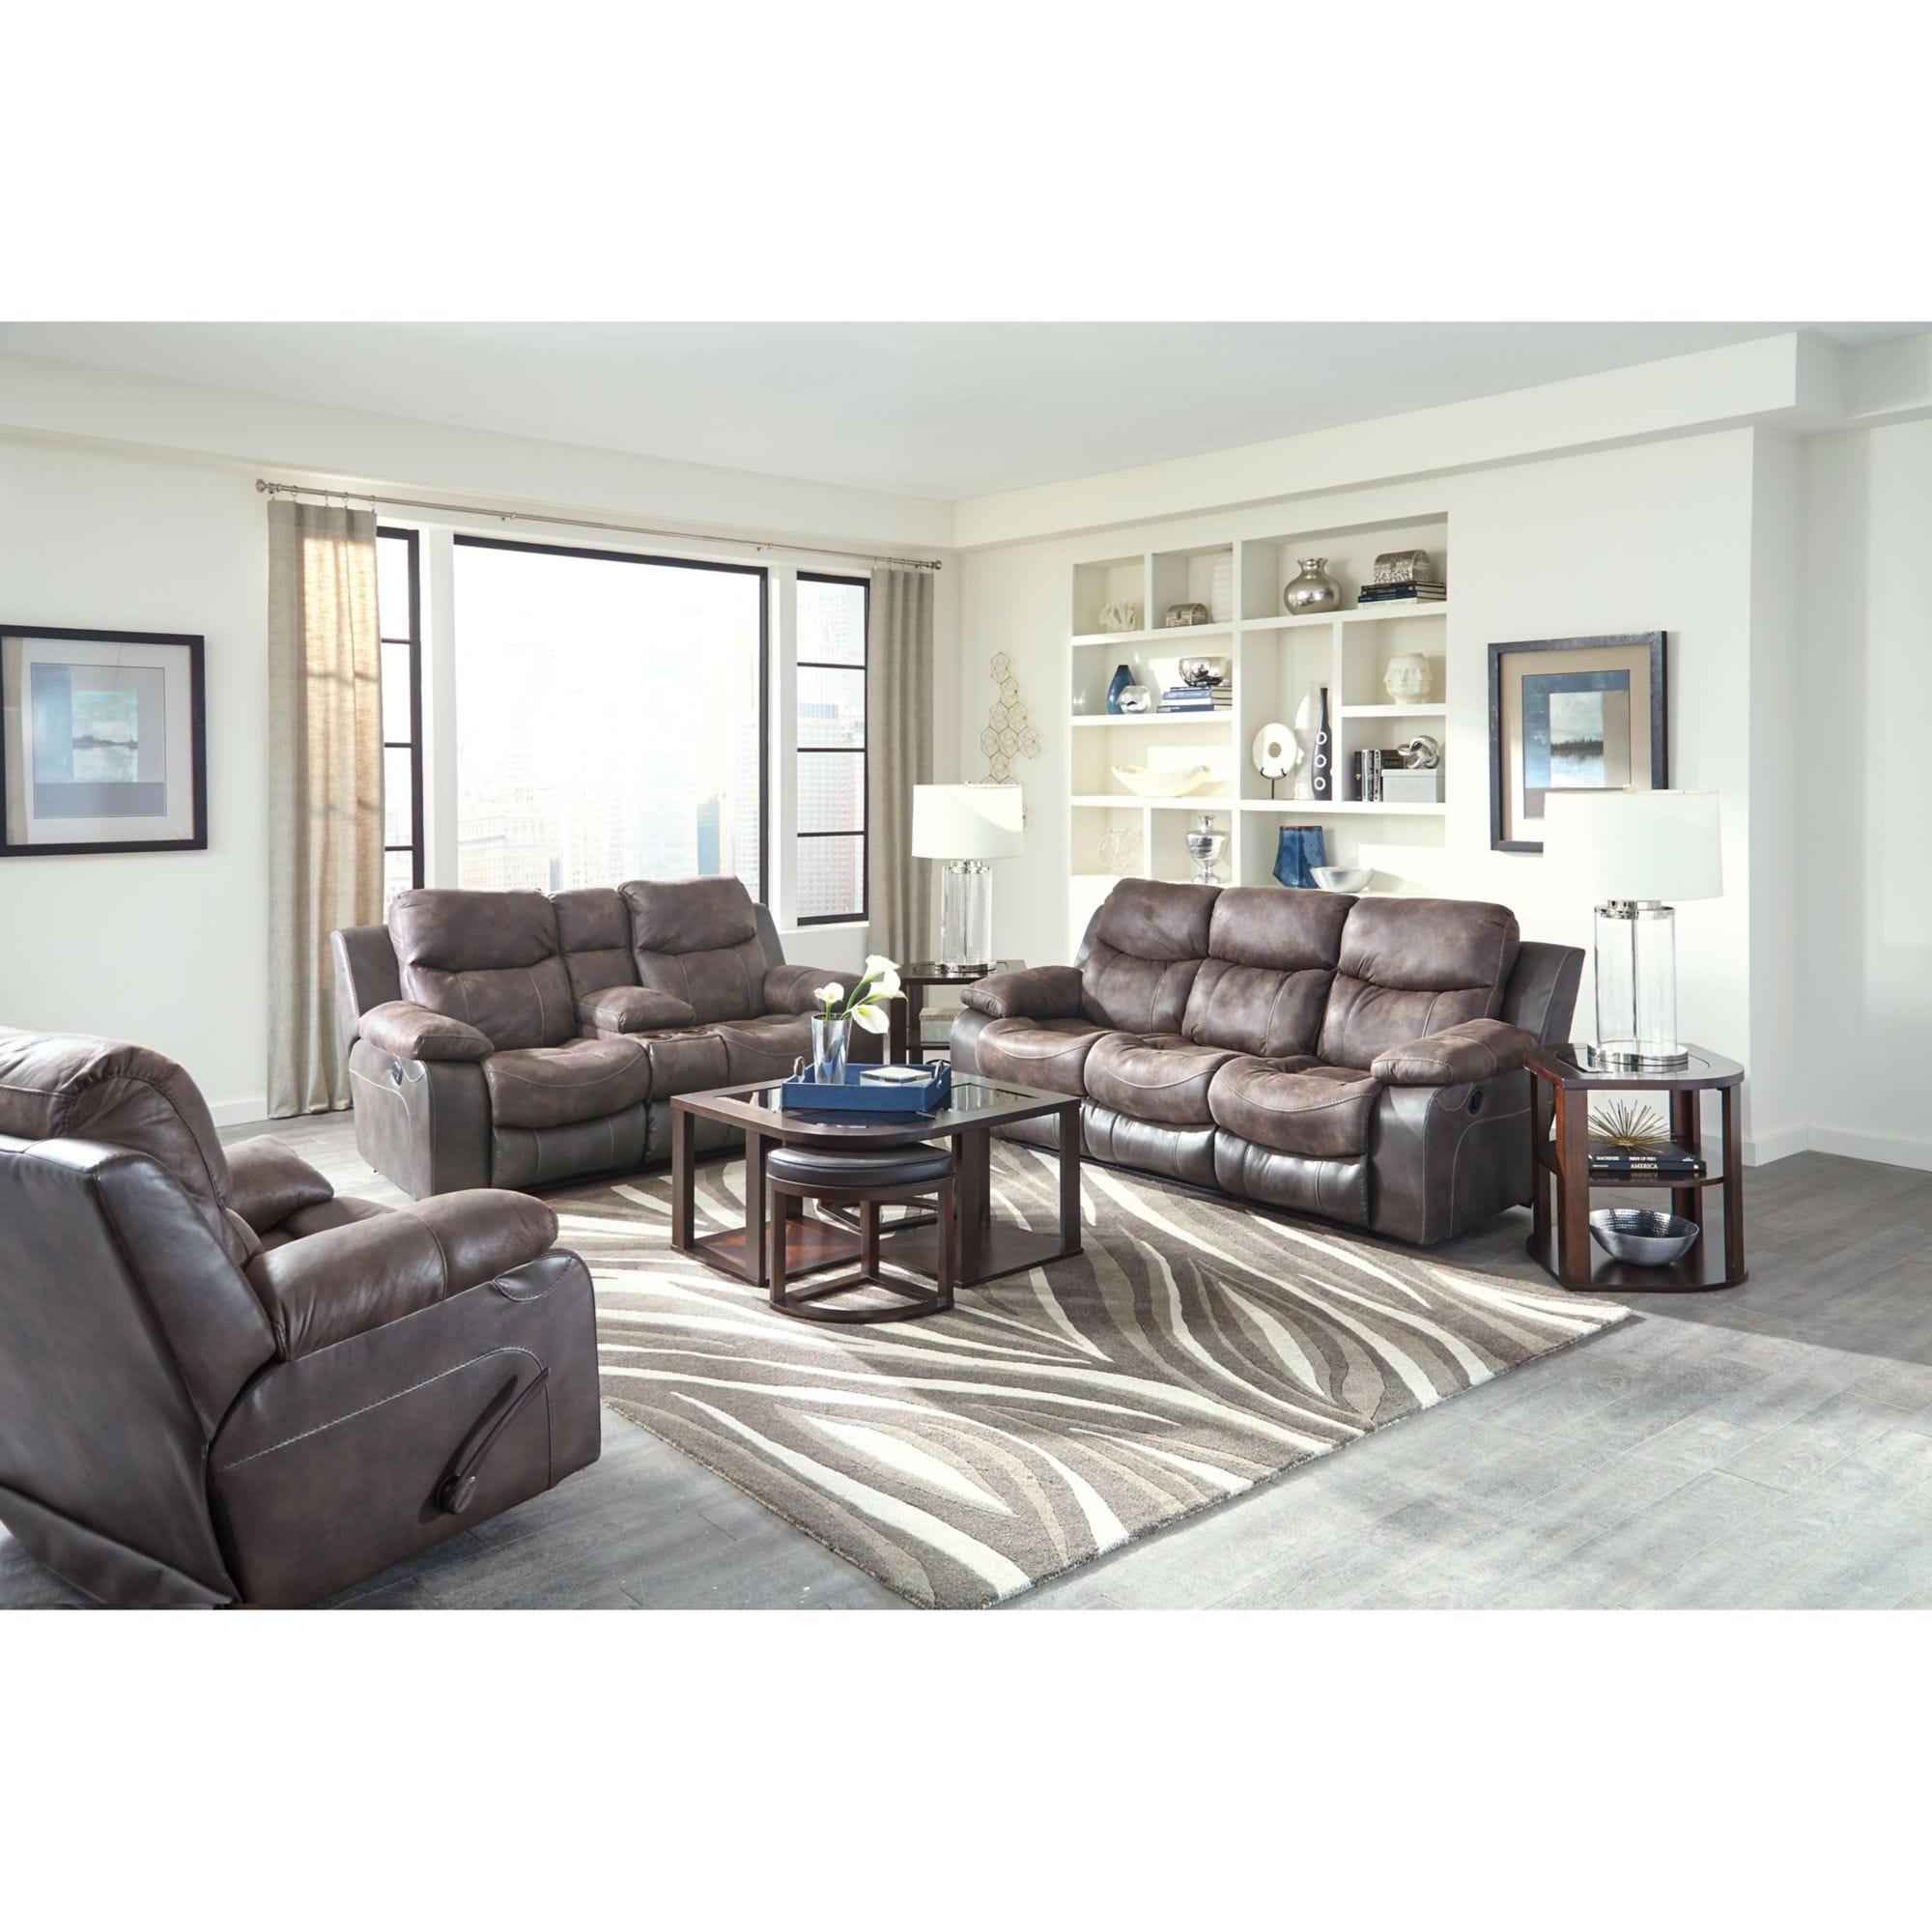 Swivel Recliner Chairs - US Mattress